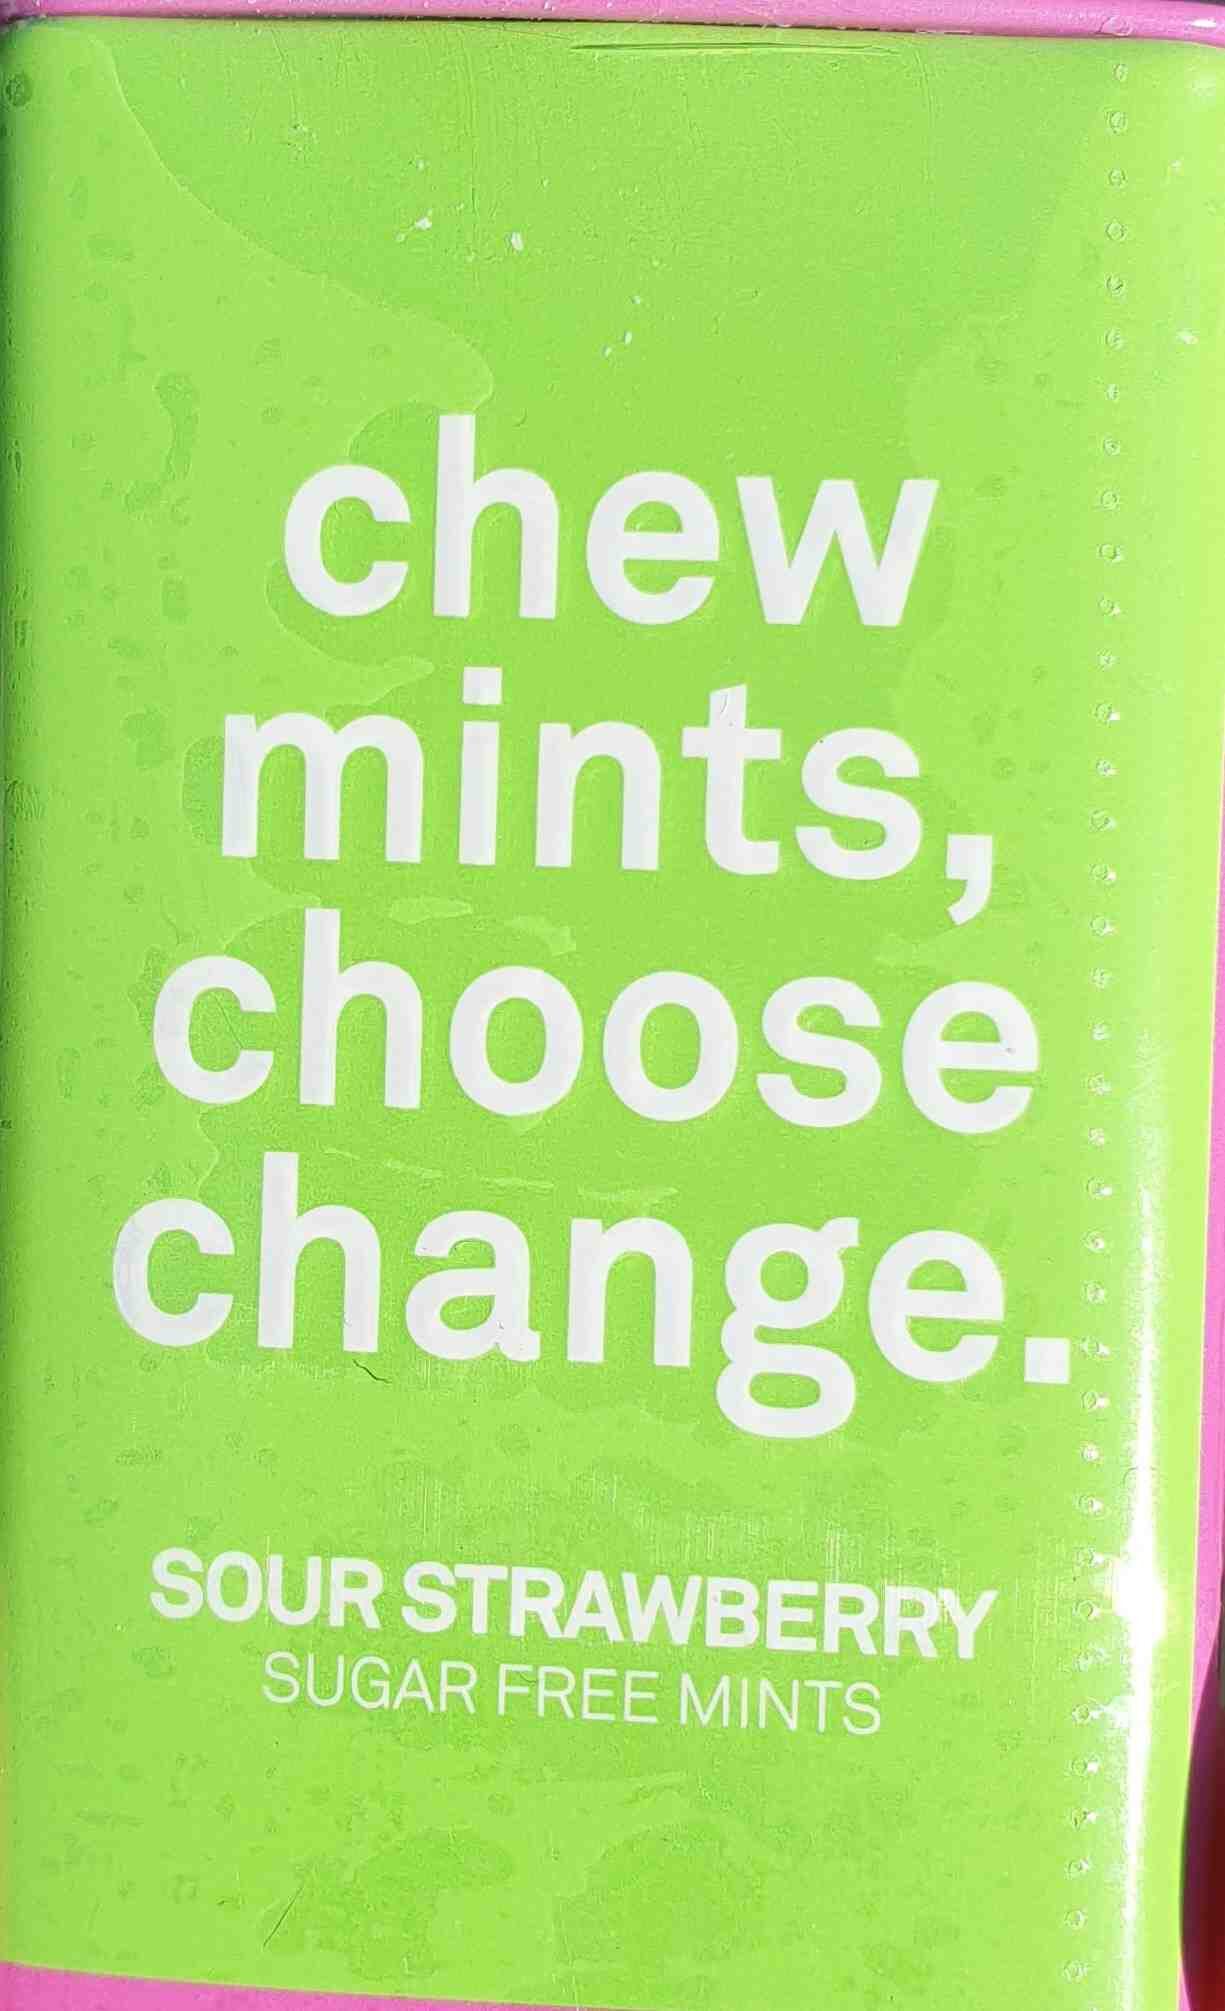 Sour Strawberry Mints - Product